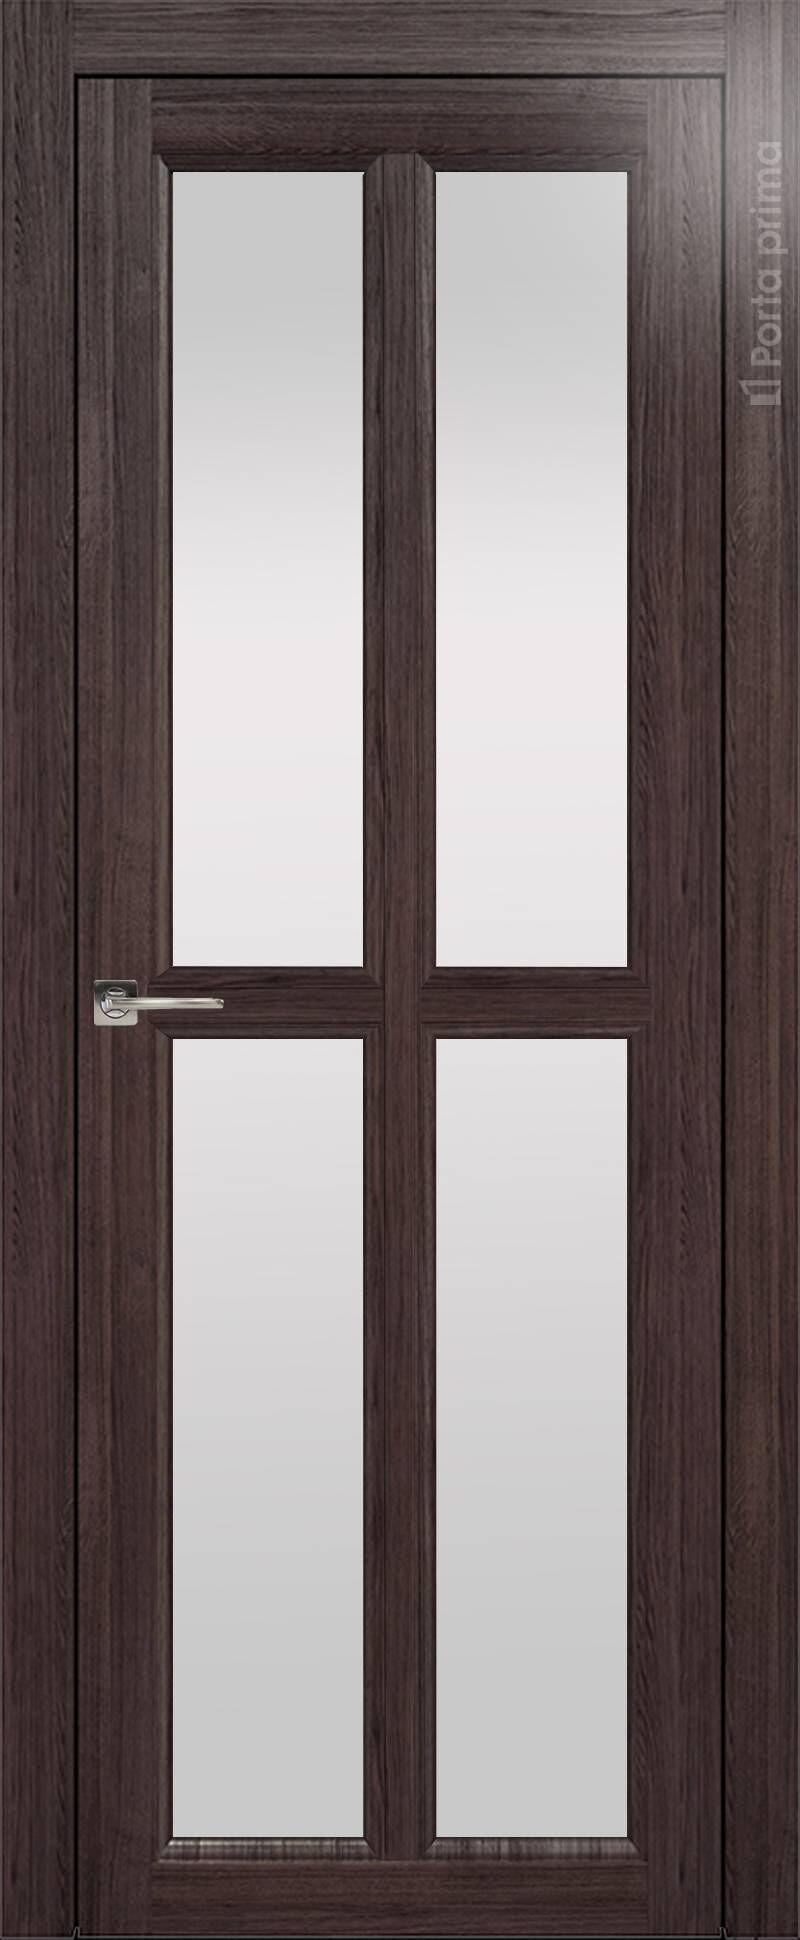 Sorrento-R И4 цвет - Венге Нуар Со стеклом (ДО)